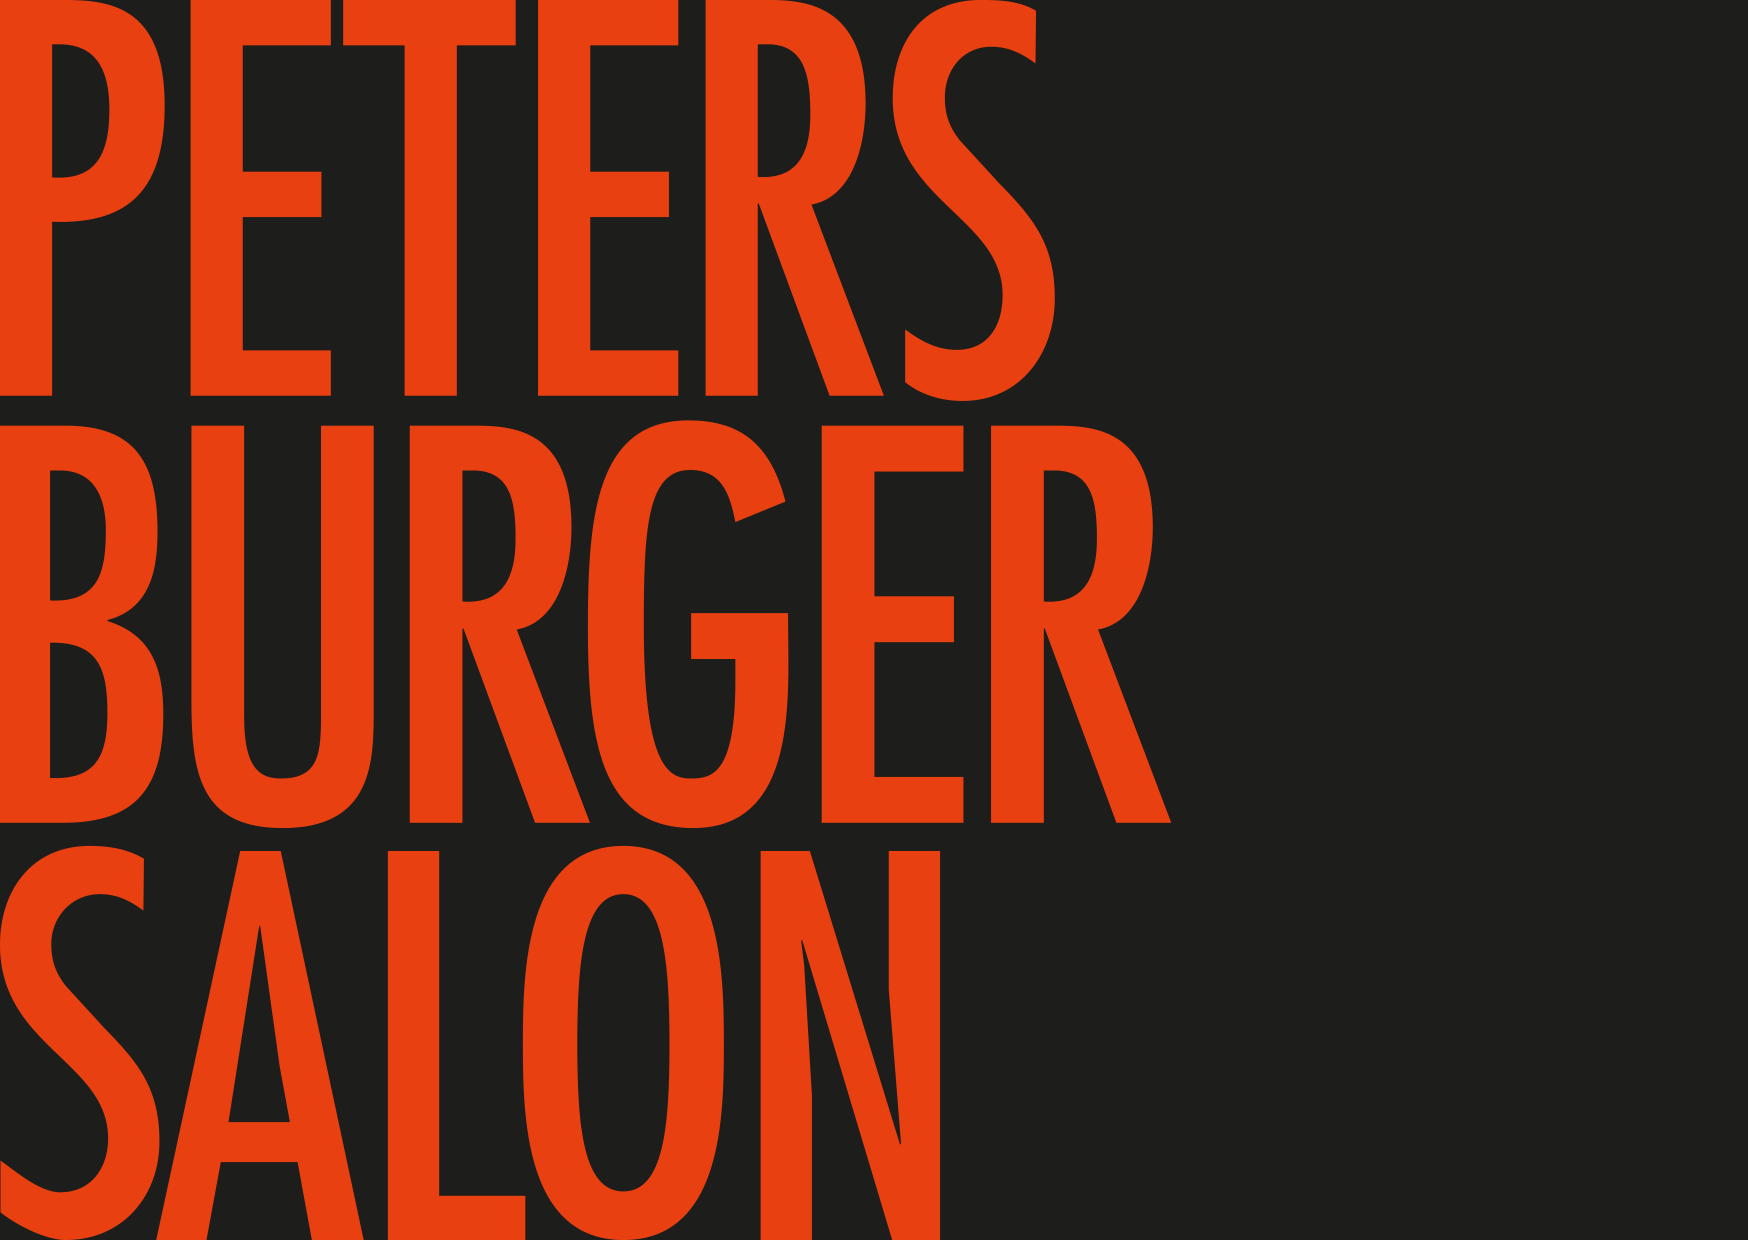 PETERSBURGER SALON